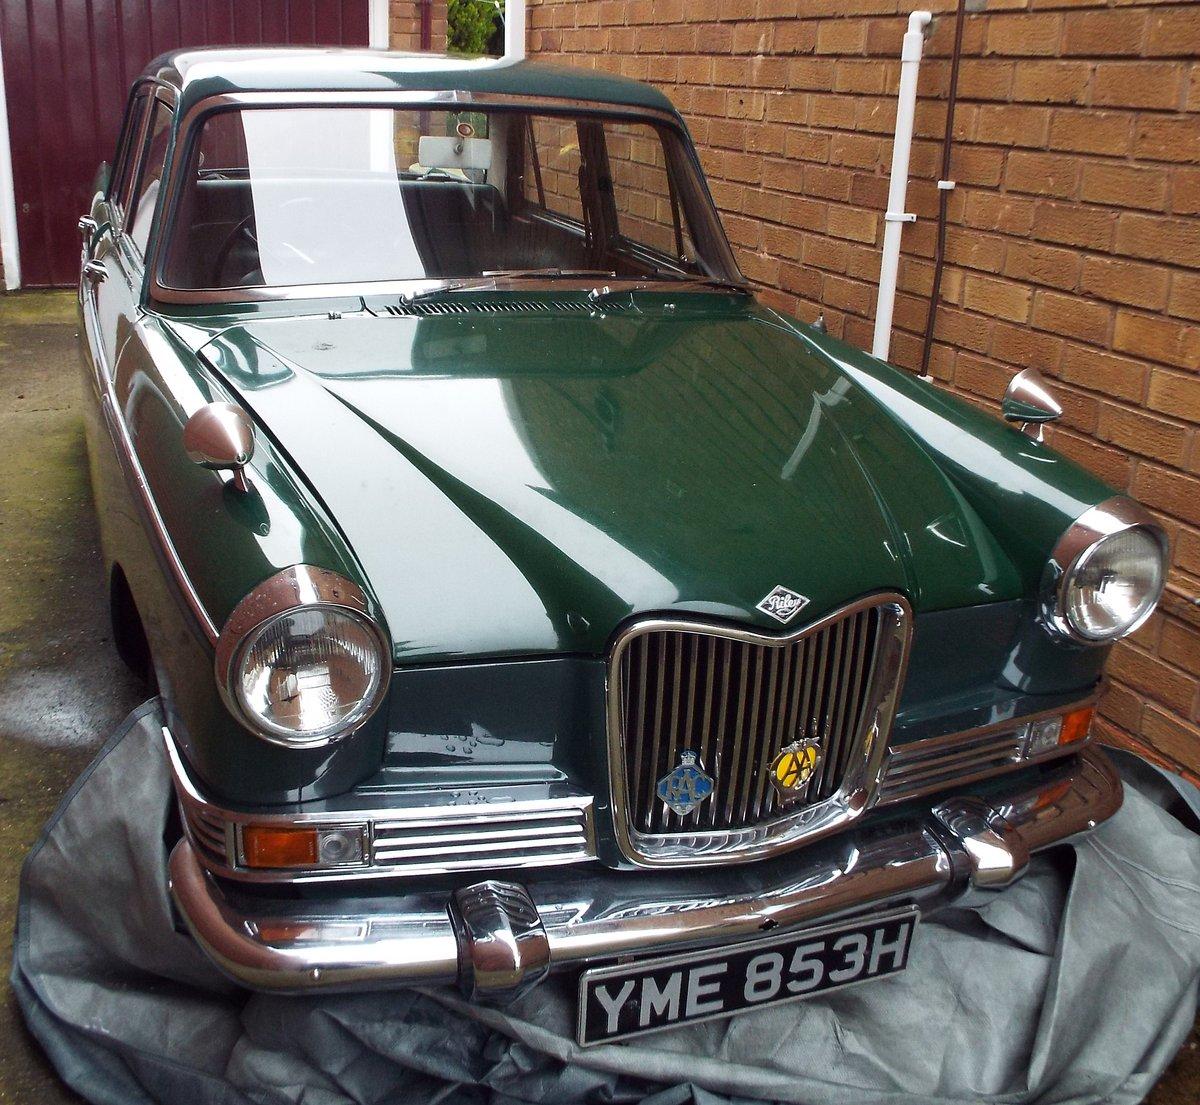 1969/70 Riley 4/72 Very Sound And Original Car SOLD